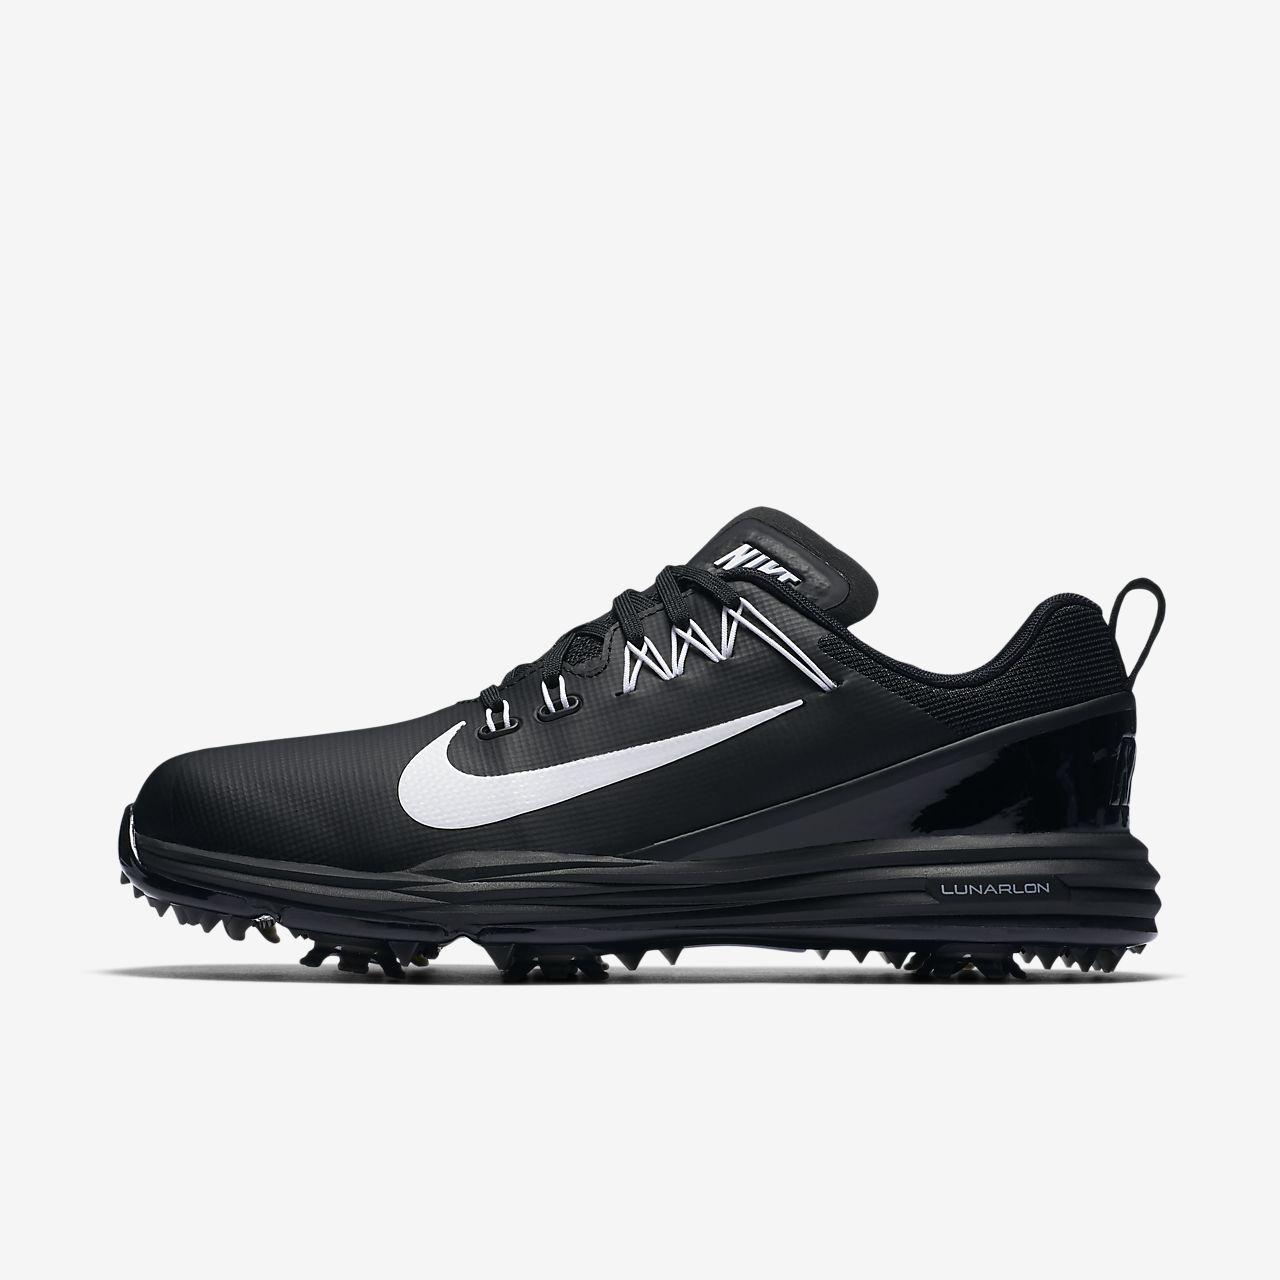 low cost 776a9 3593f ... Nike Lunar Command 2 Zapatillas de golf - Mujer